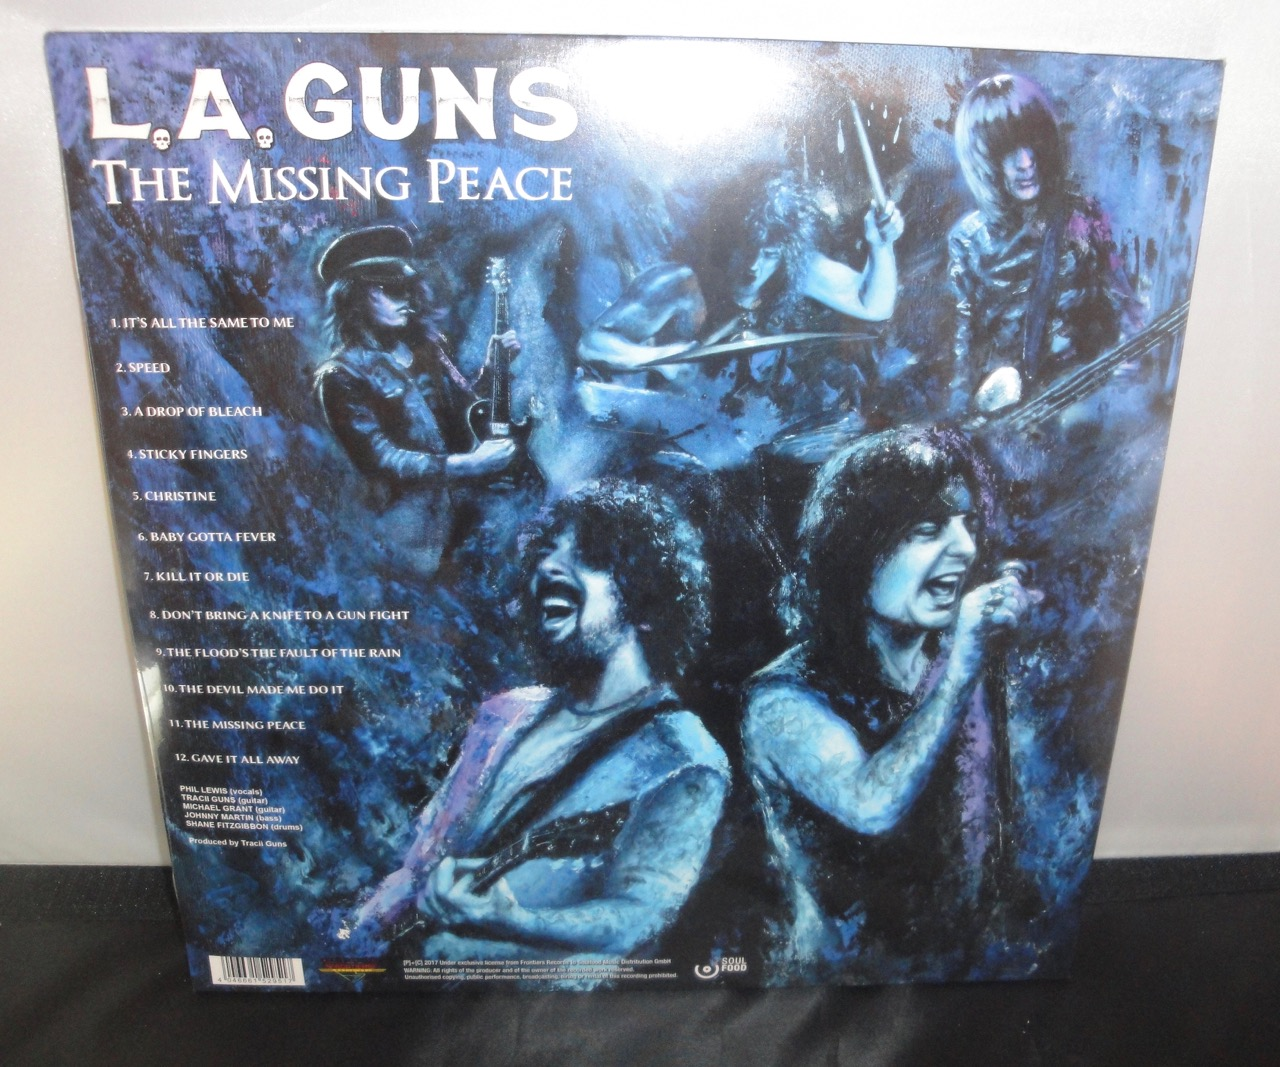 L.A. Guns - The Missing Peace - Limited Edition, Gatefold Jacket, Black, 2XLP, 2017